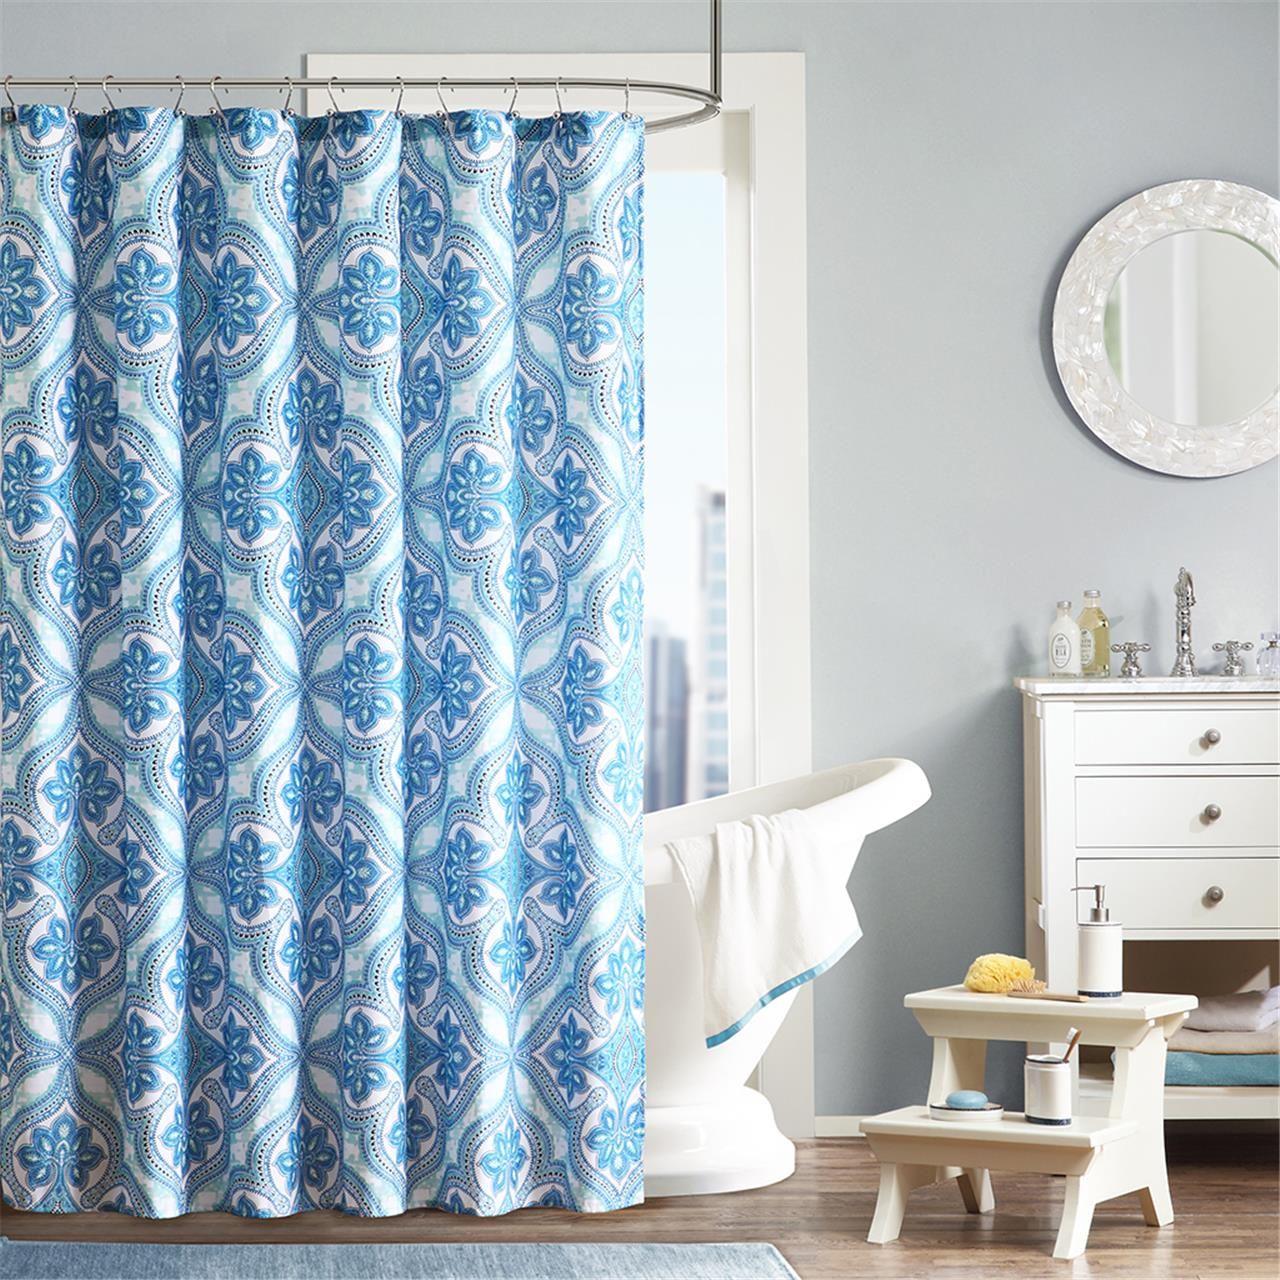 Intelligent Design Shower Curtain Fabric Shower Curtains